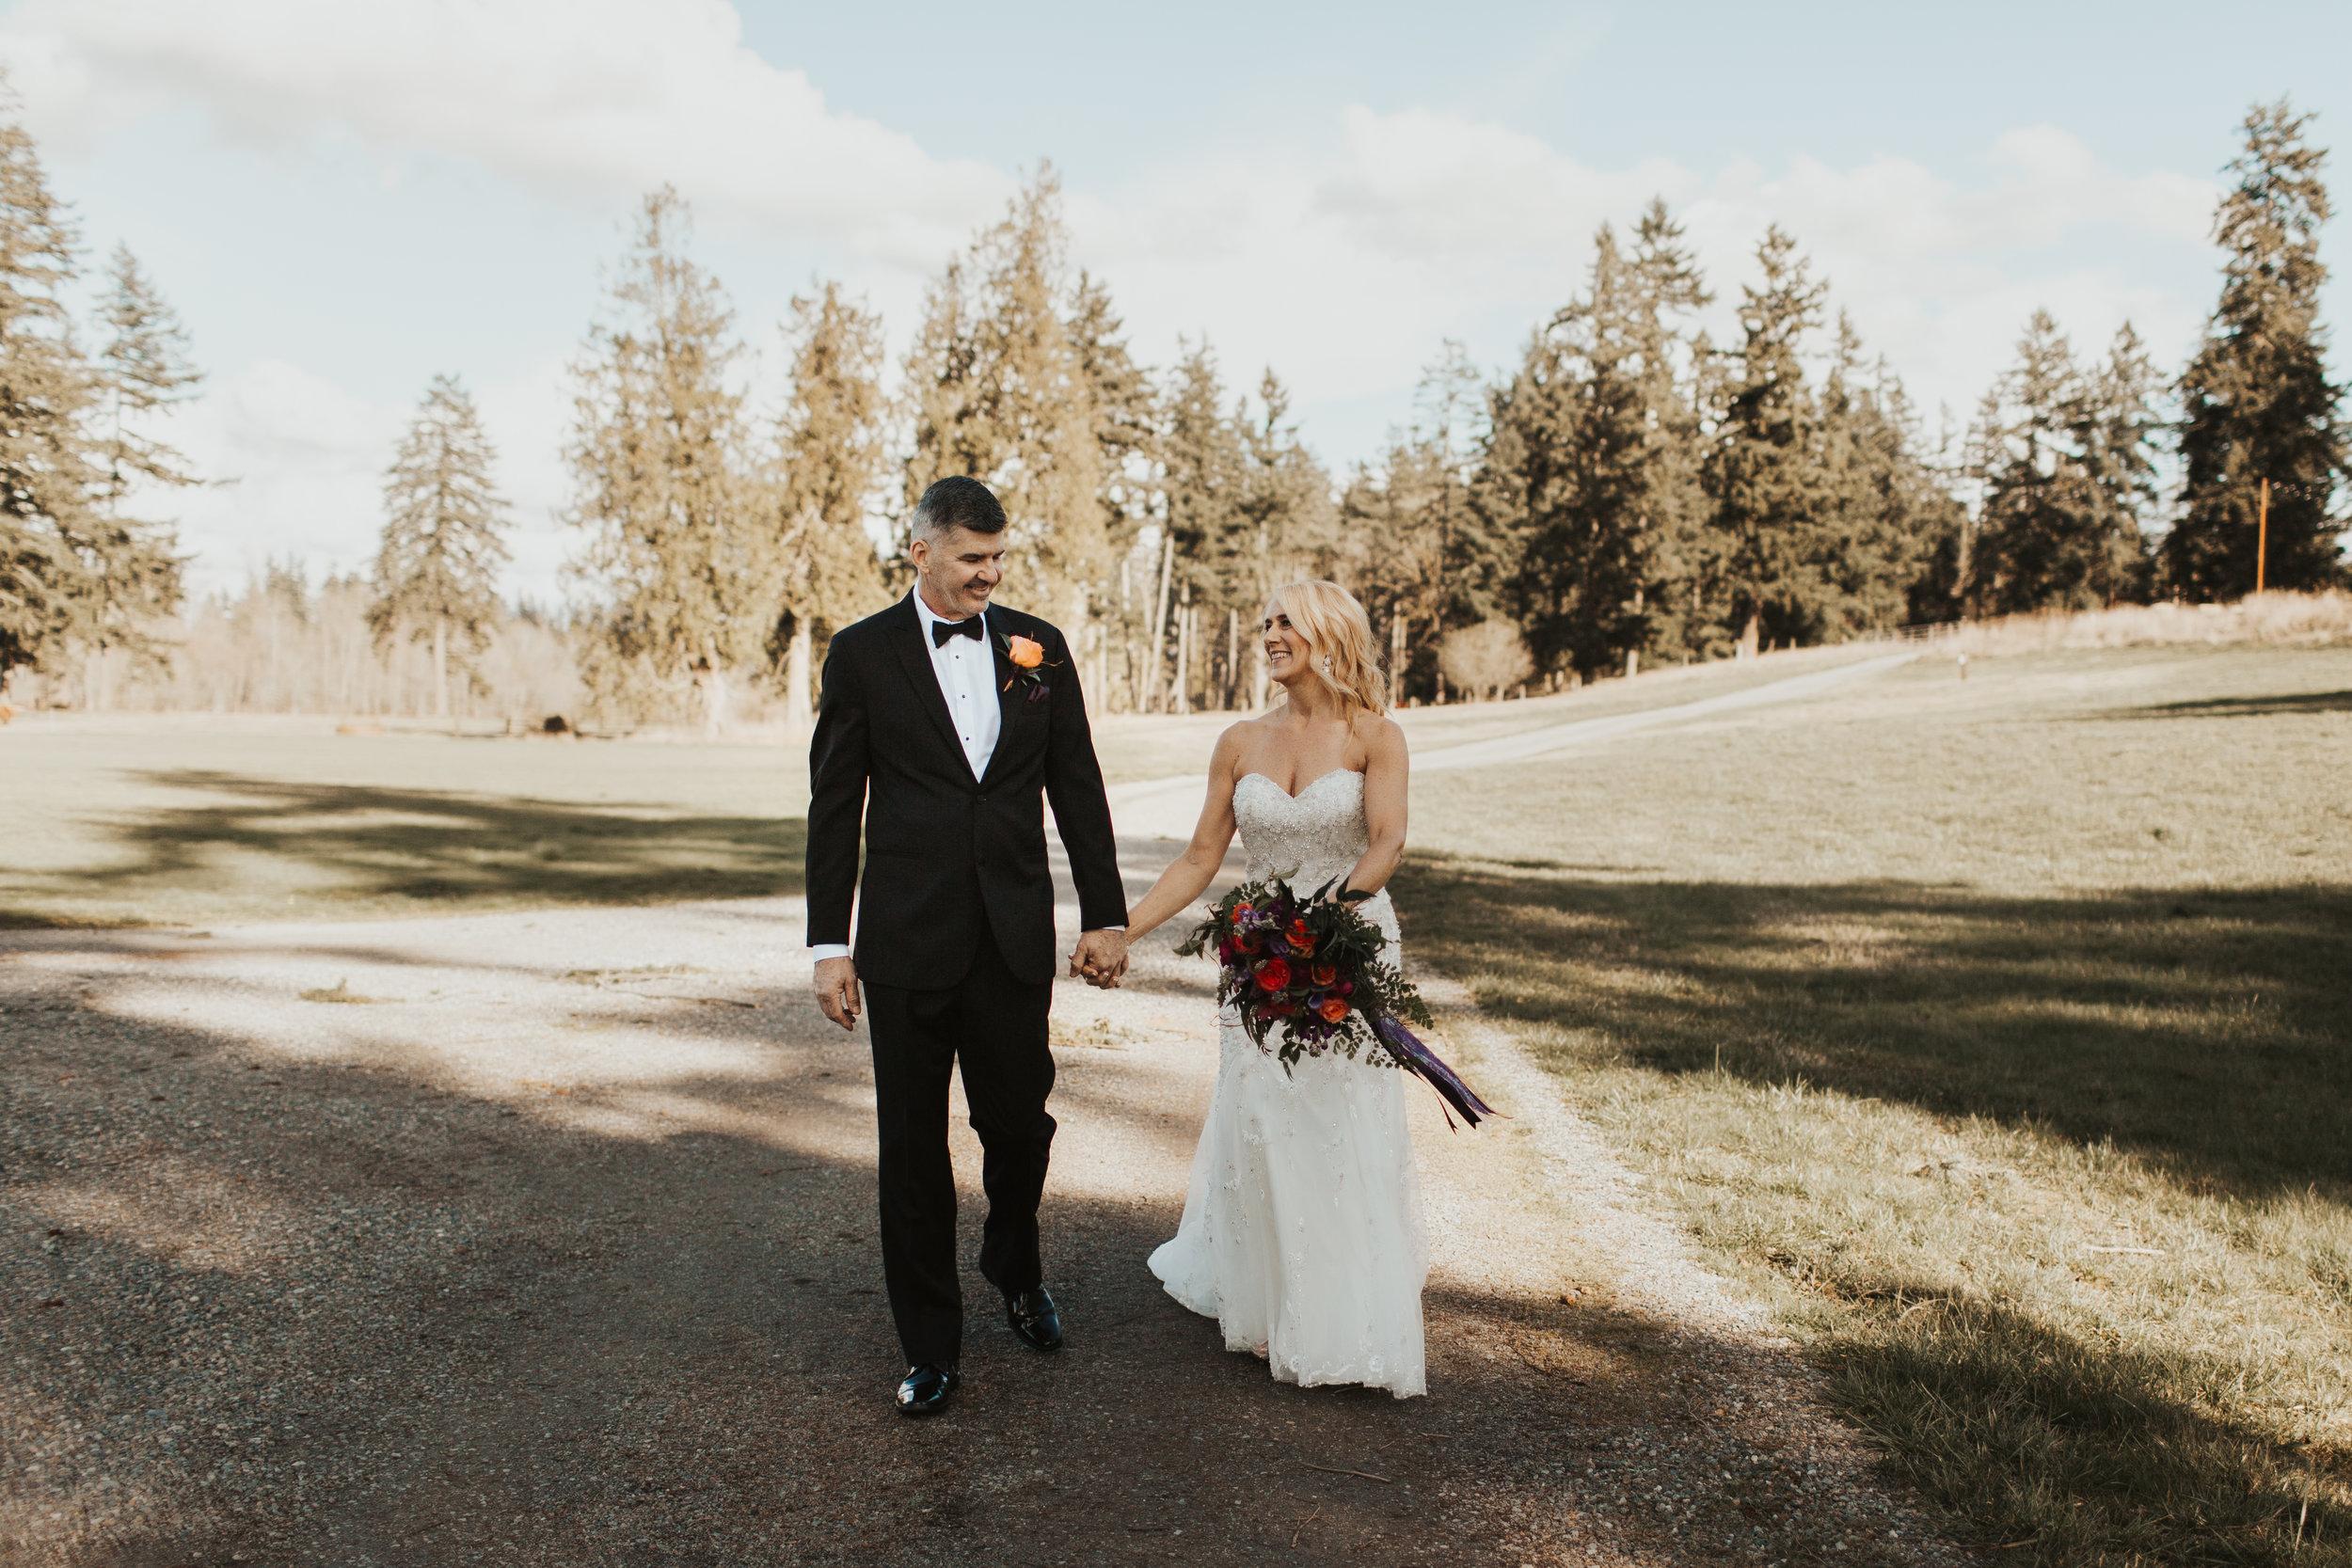 ginapauslon_deenateel_wedding-154.jpg